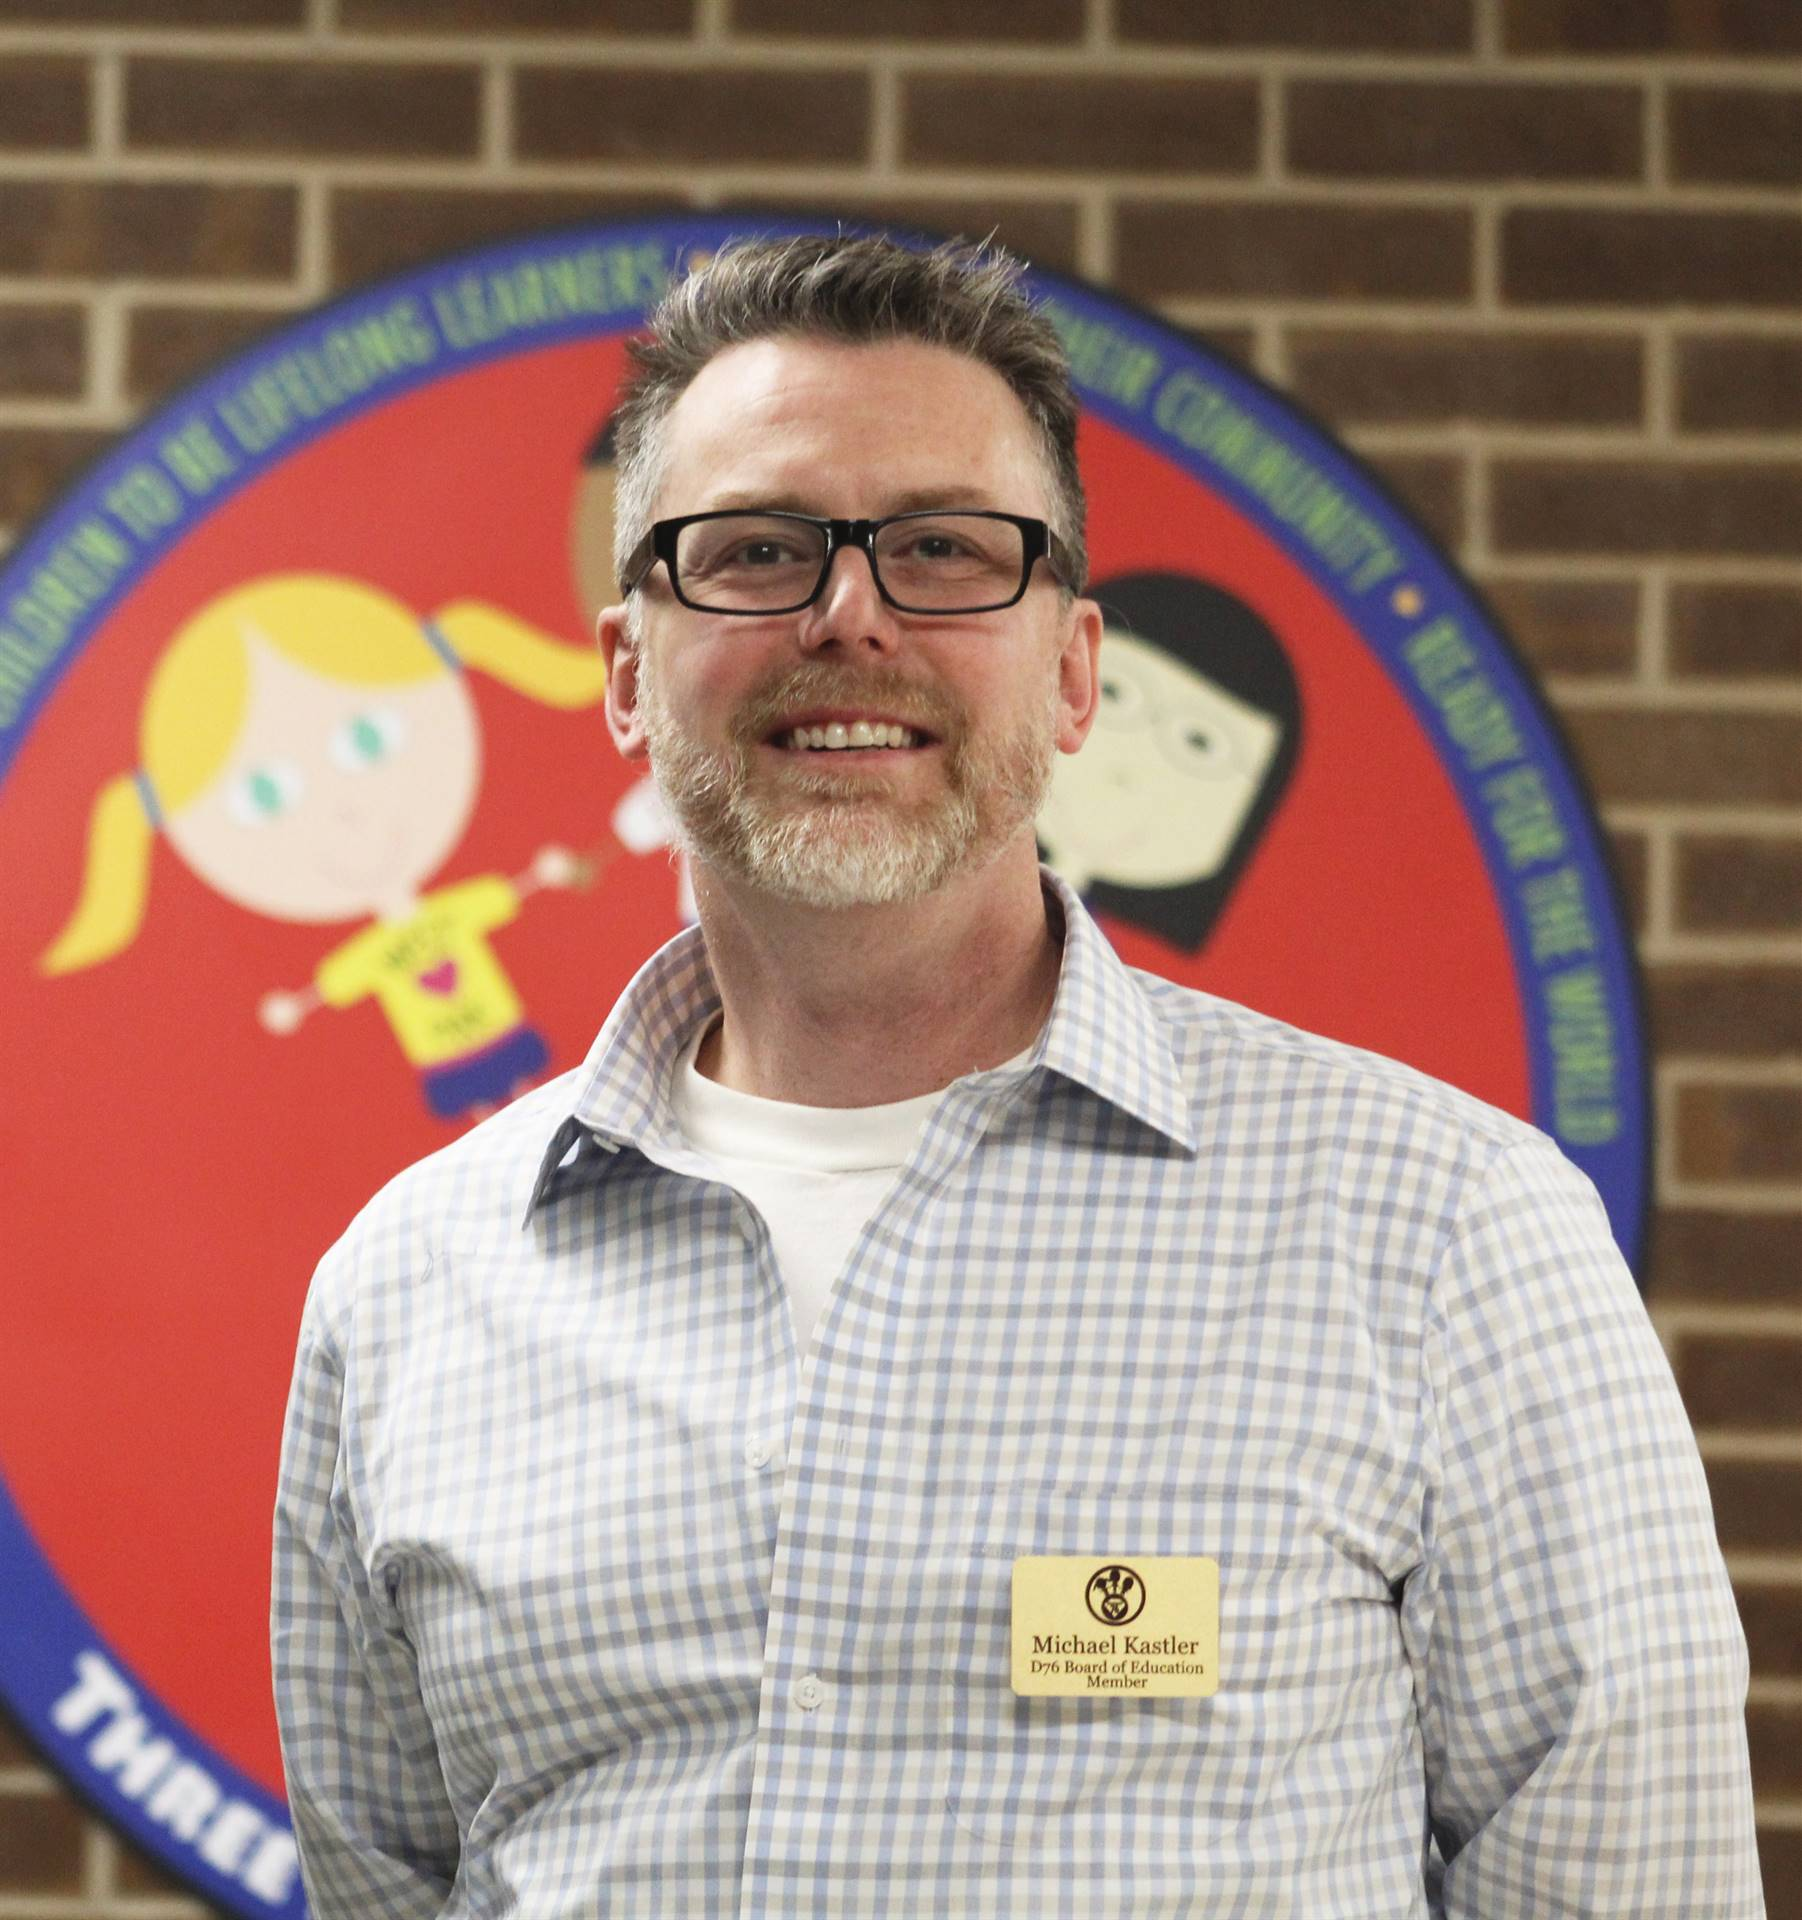 Michael Kastler: Secretary